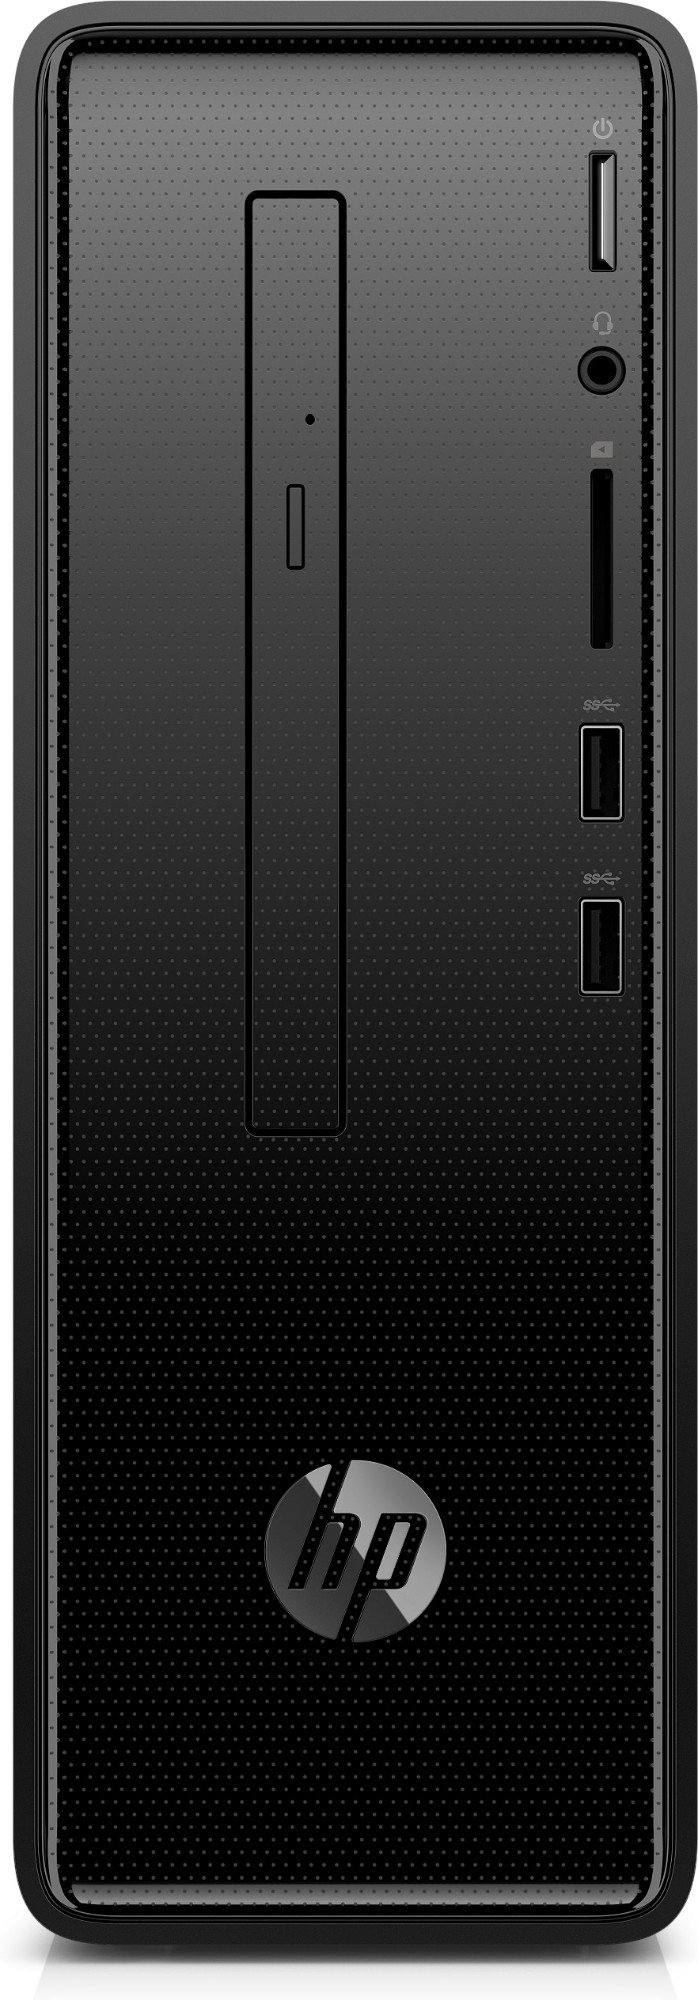 HP Slimline 290-a0007na 7th Generation AMD A6-Series APUs A6-9225 4 GB DDR4-SDRAM 1000 GB HDD Mini Tower Black PC Windows 10 Home